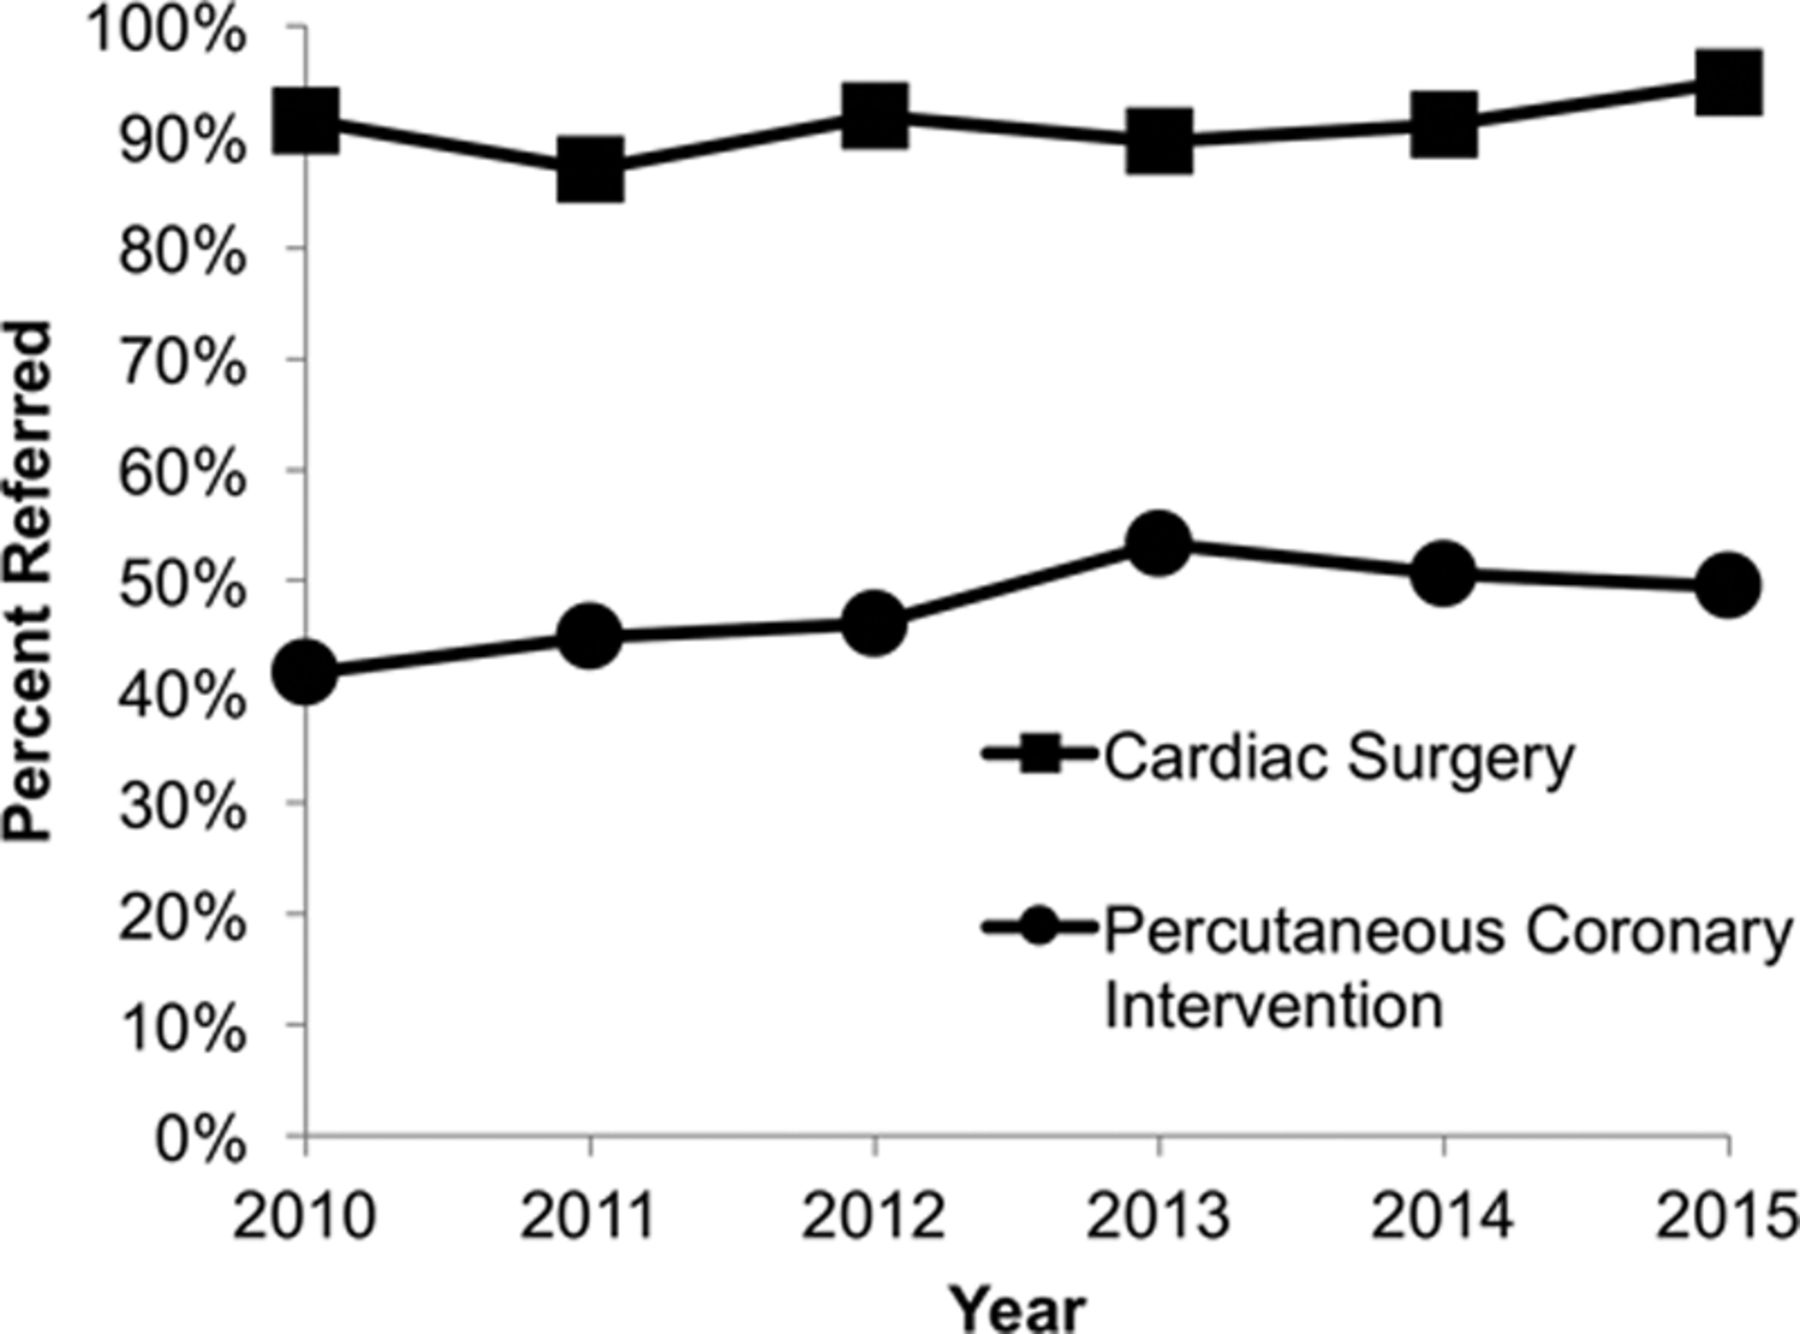 Referral To Cardiac Rehabilitation After Percutaneous